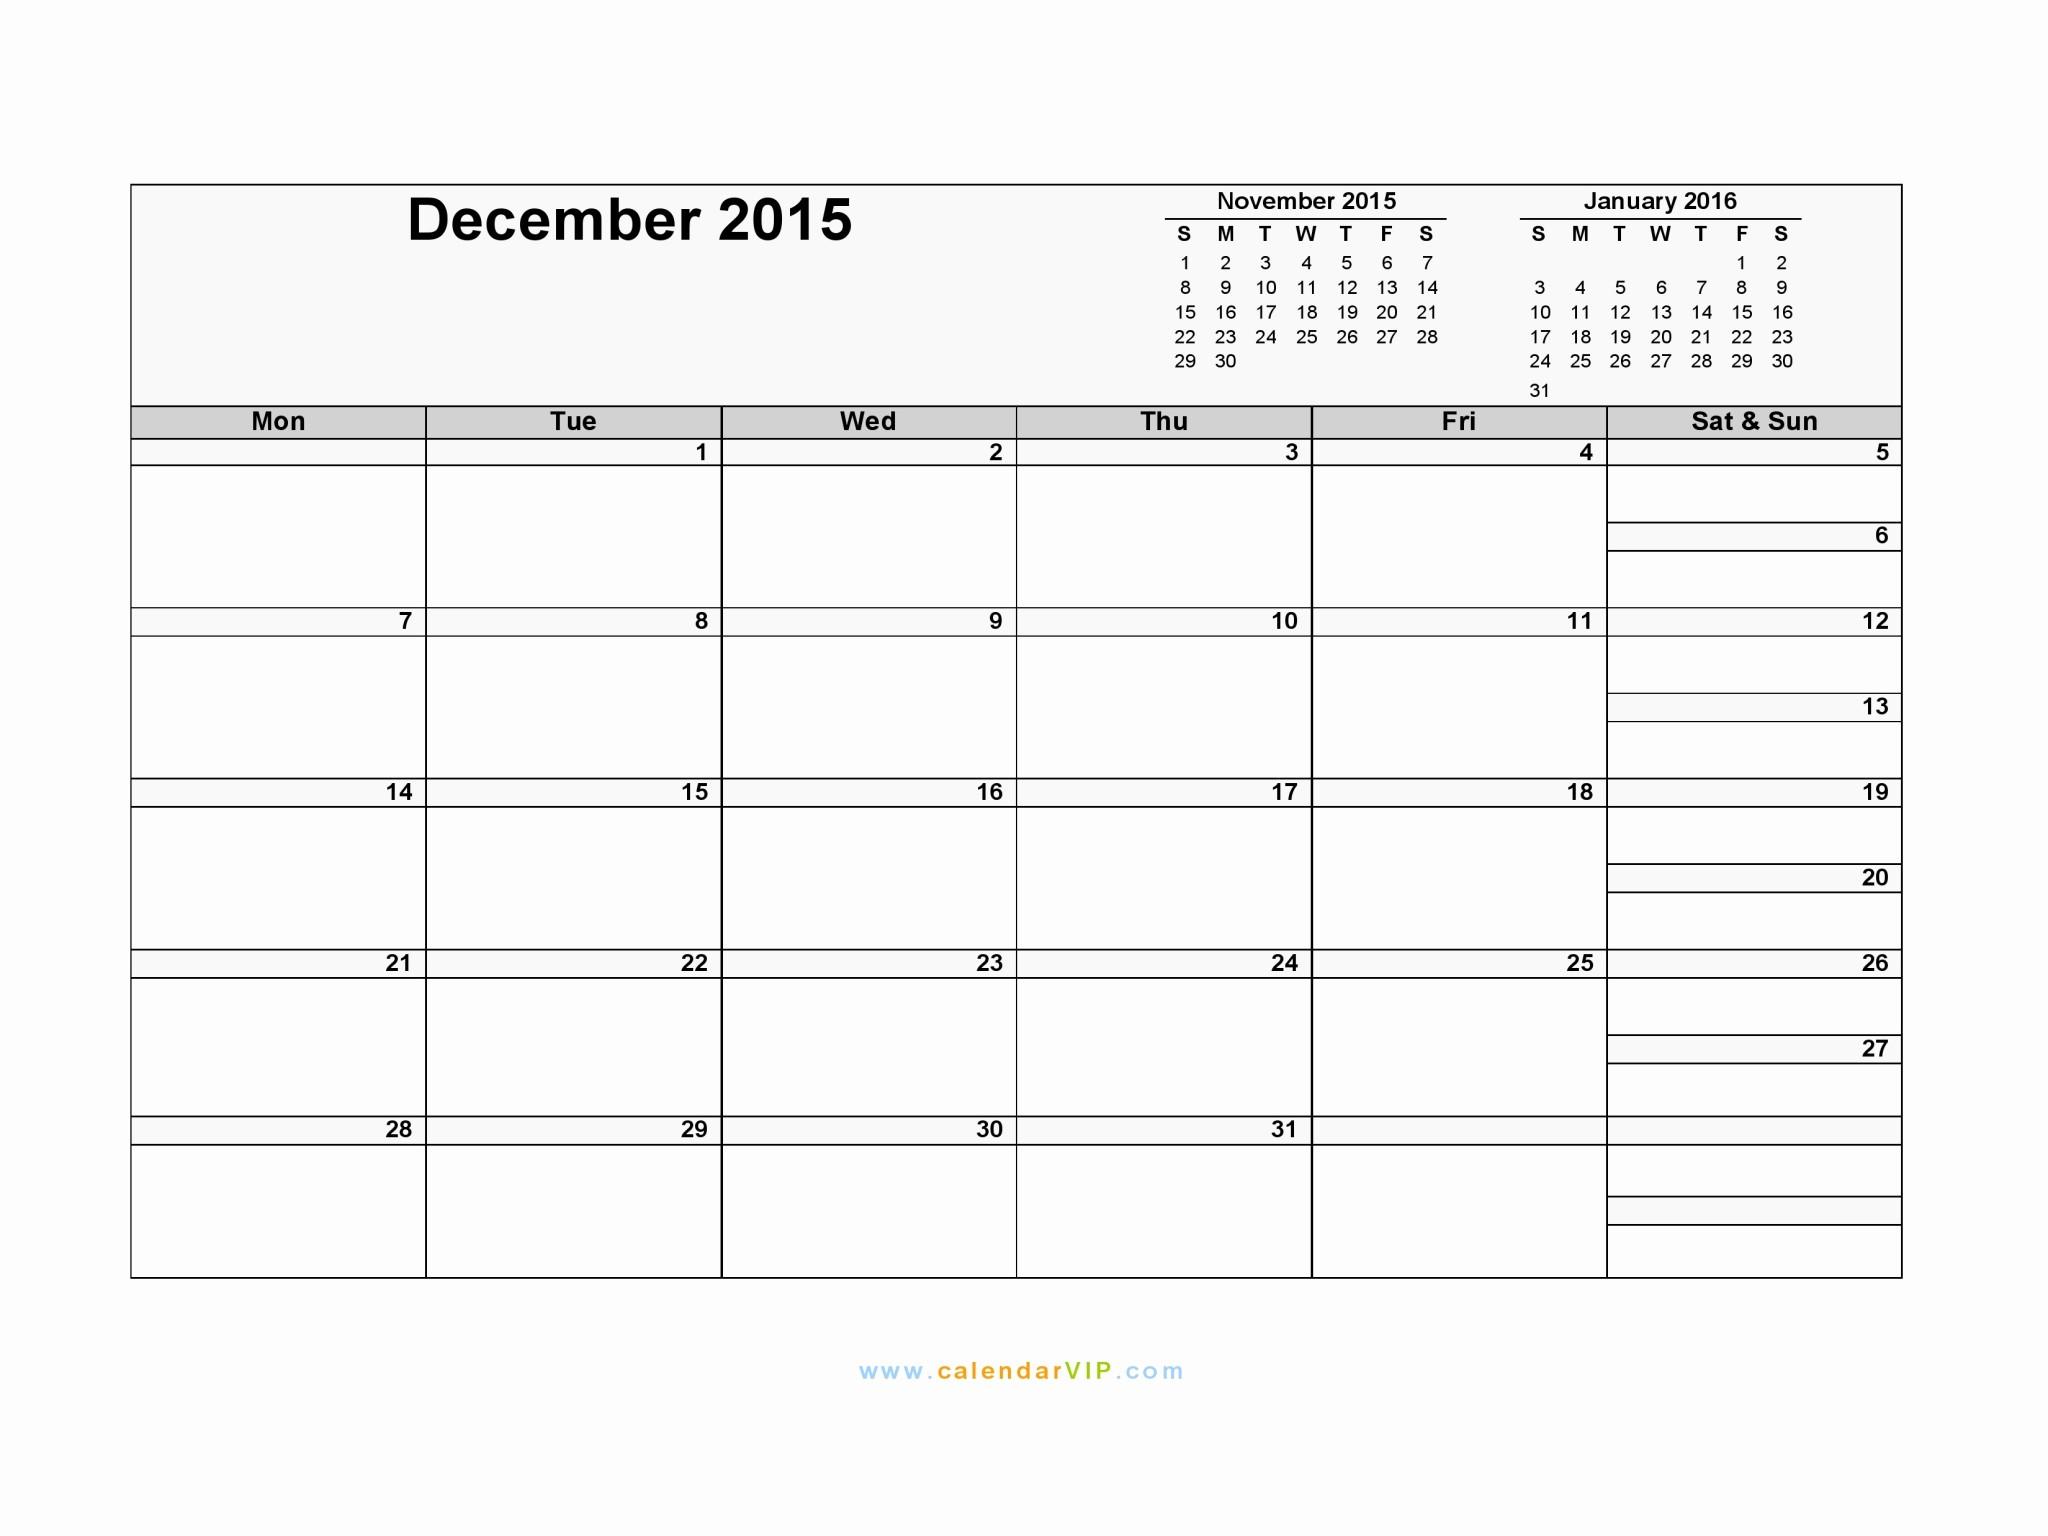 December 2015 Calendar Word Document Beautiful December 2015 Calendar Blank Printable Calendar Template